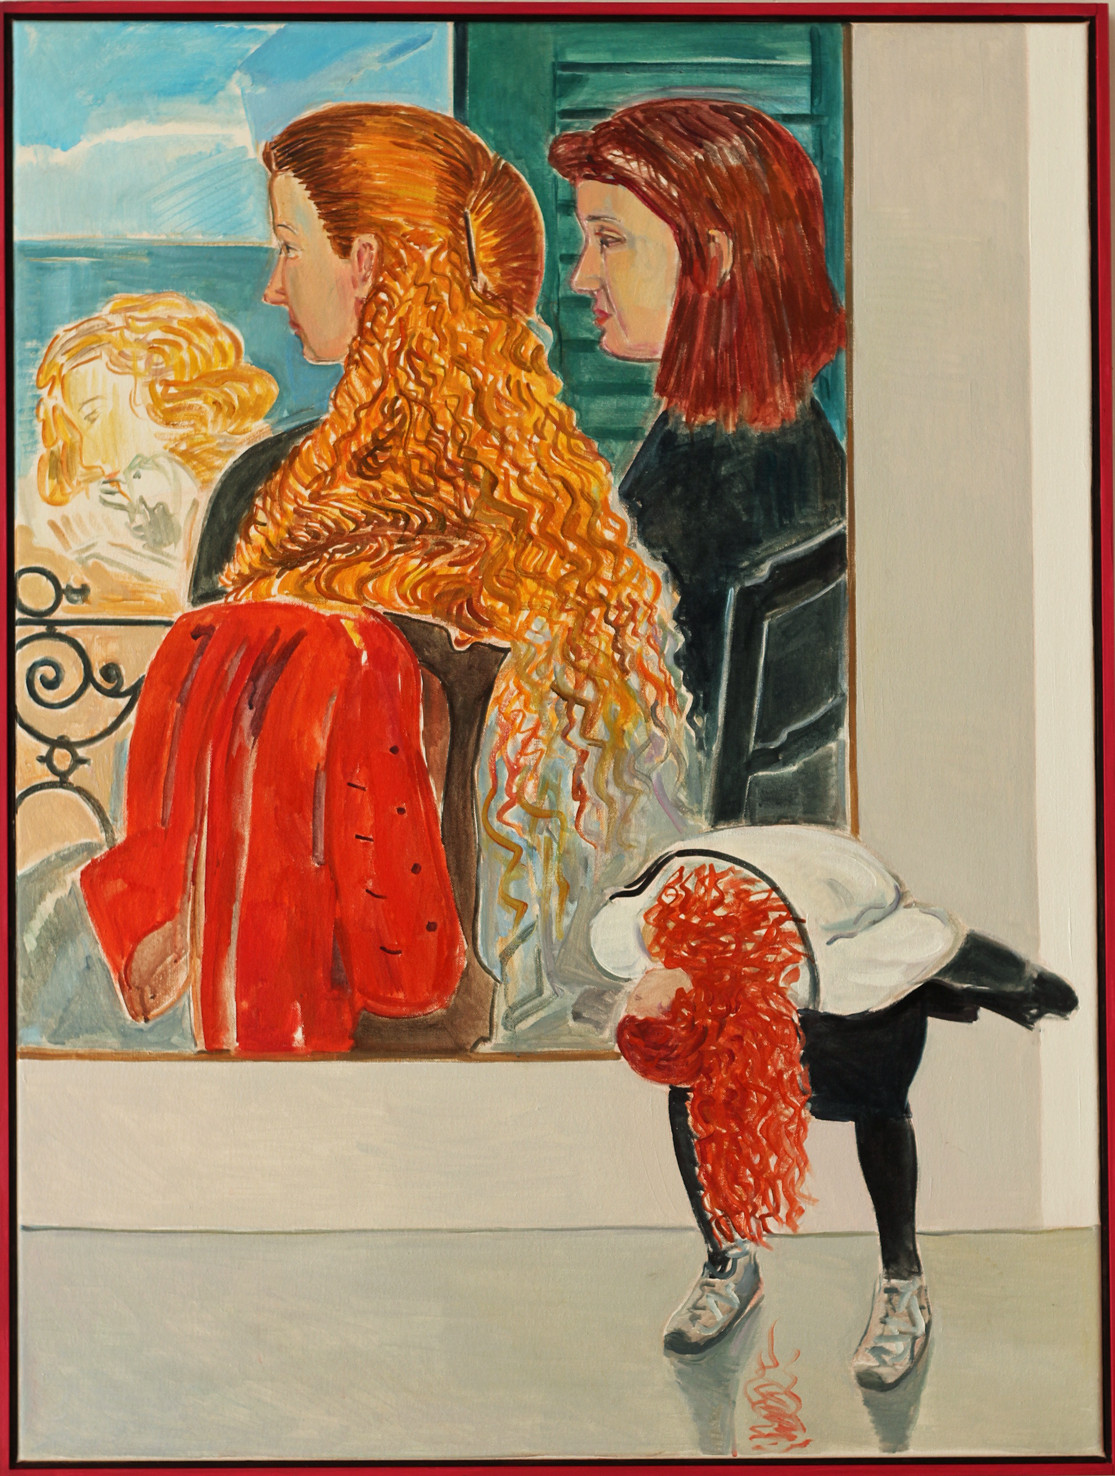 Søren Elgaard, Courbets piger